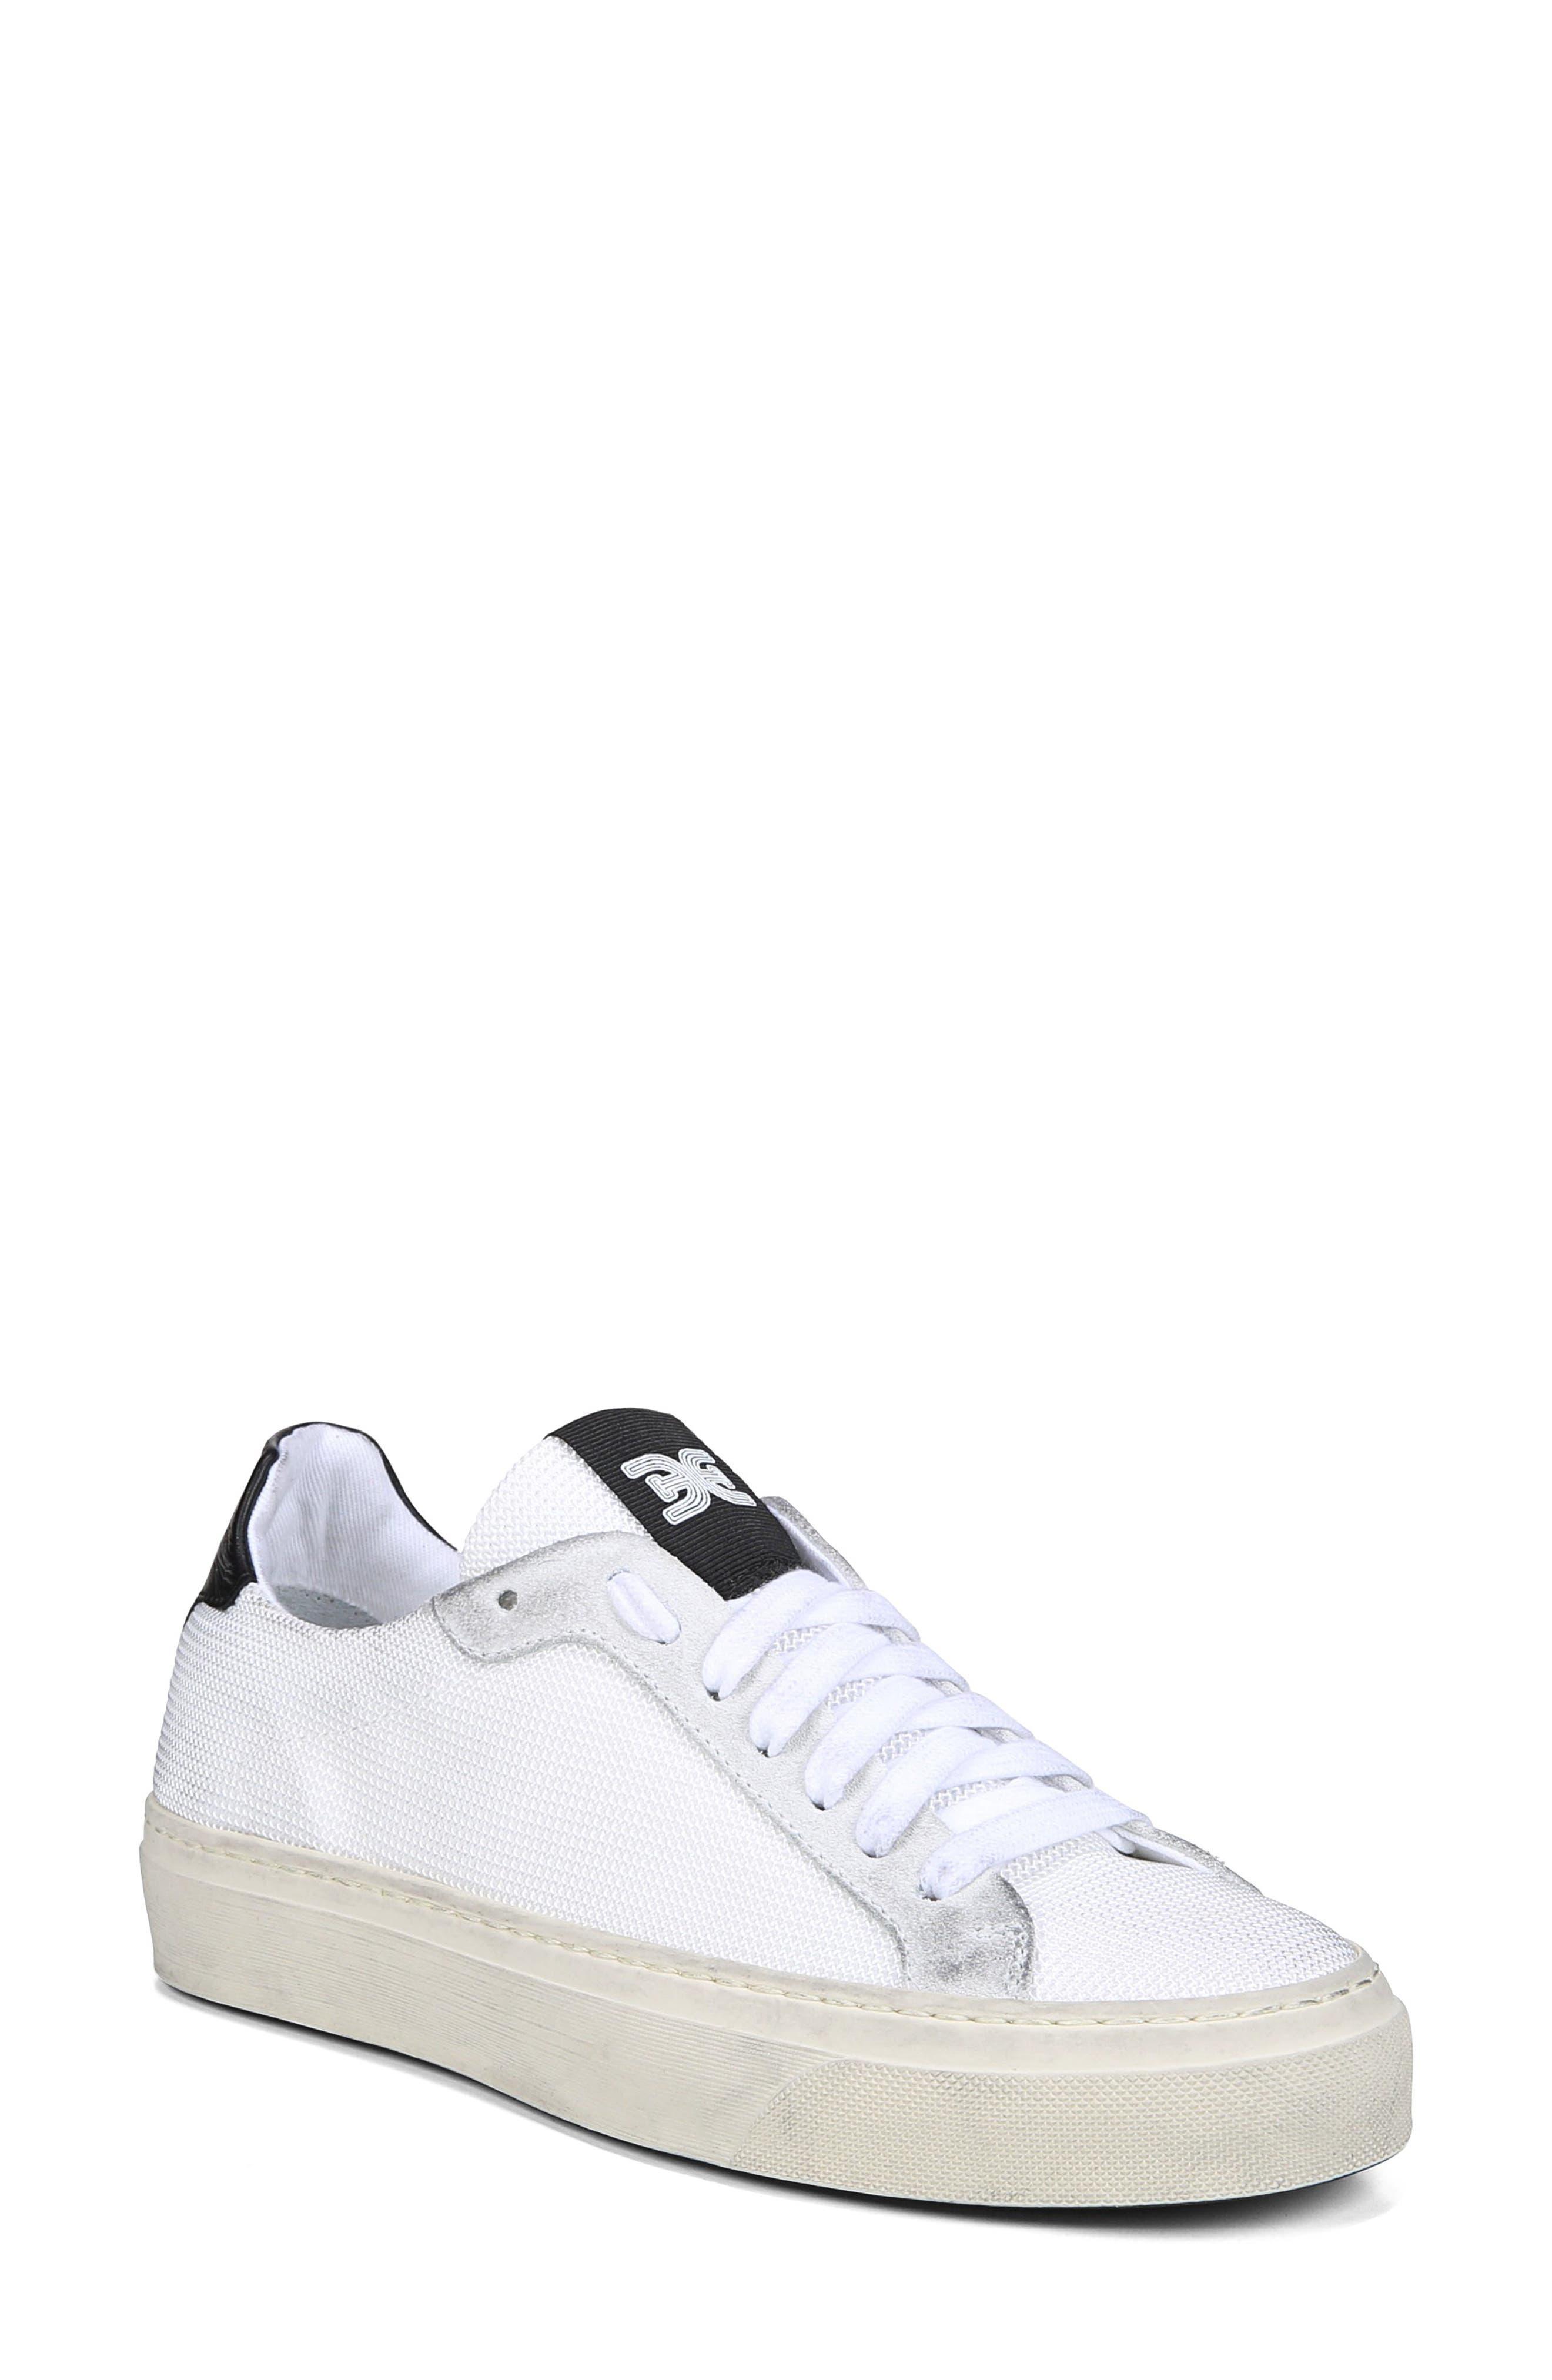 Women s Sam Edelman Tilma Sneaker E5119